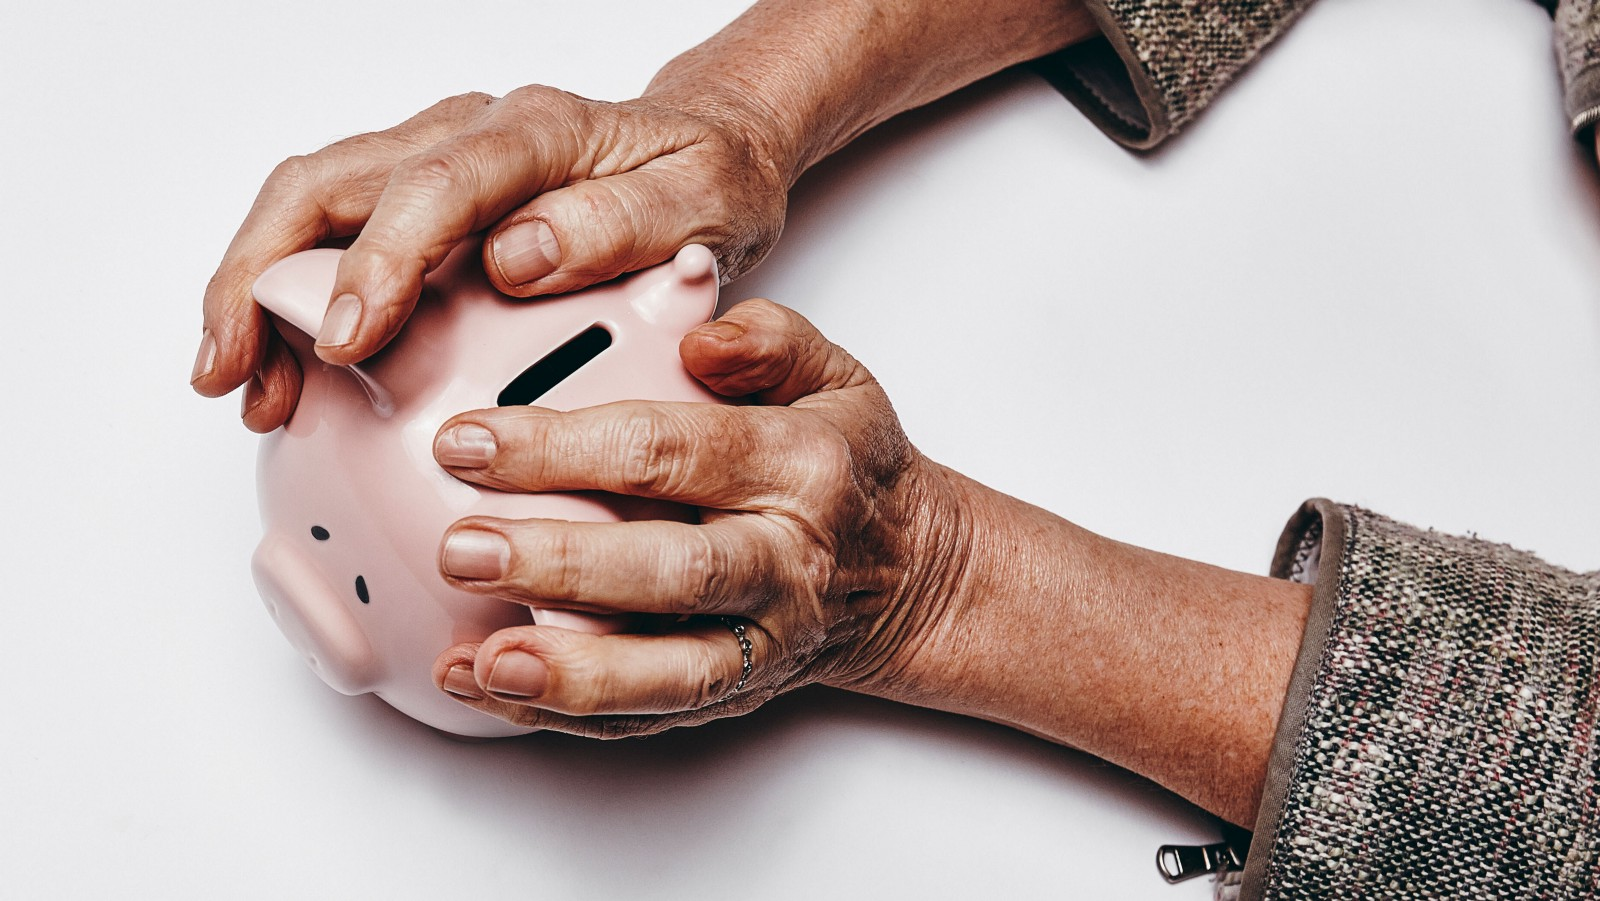 Criminals Steal $37 Billion a Year From Americas Elderly